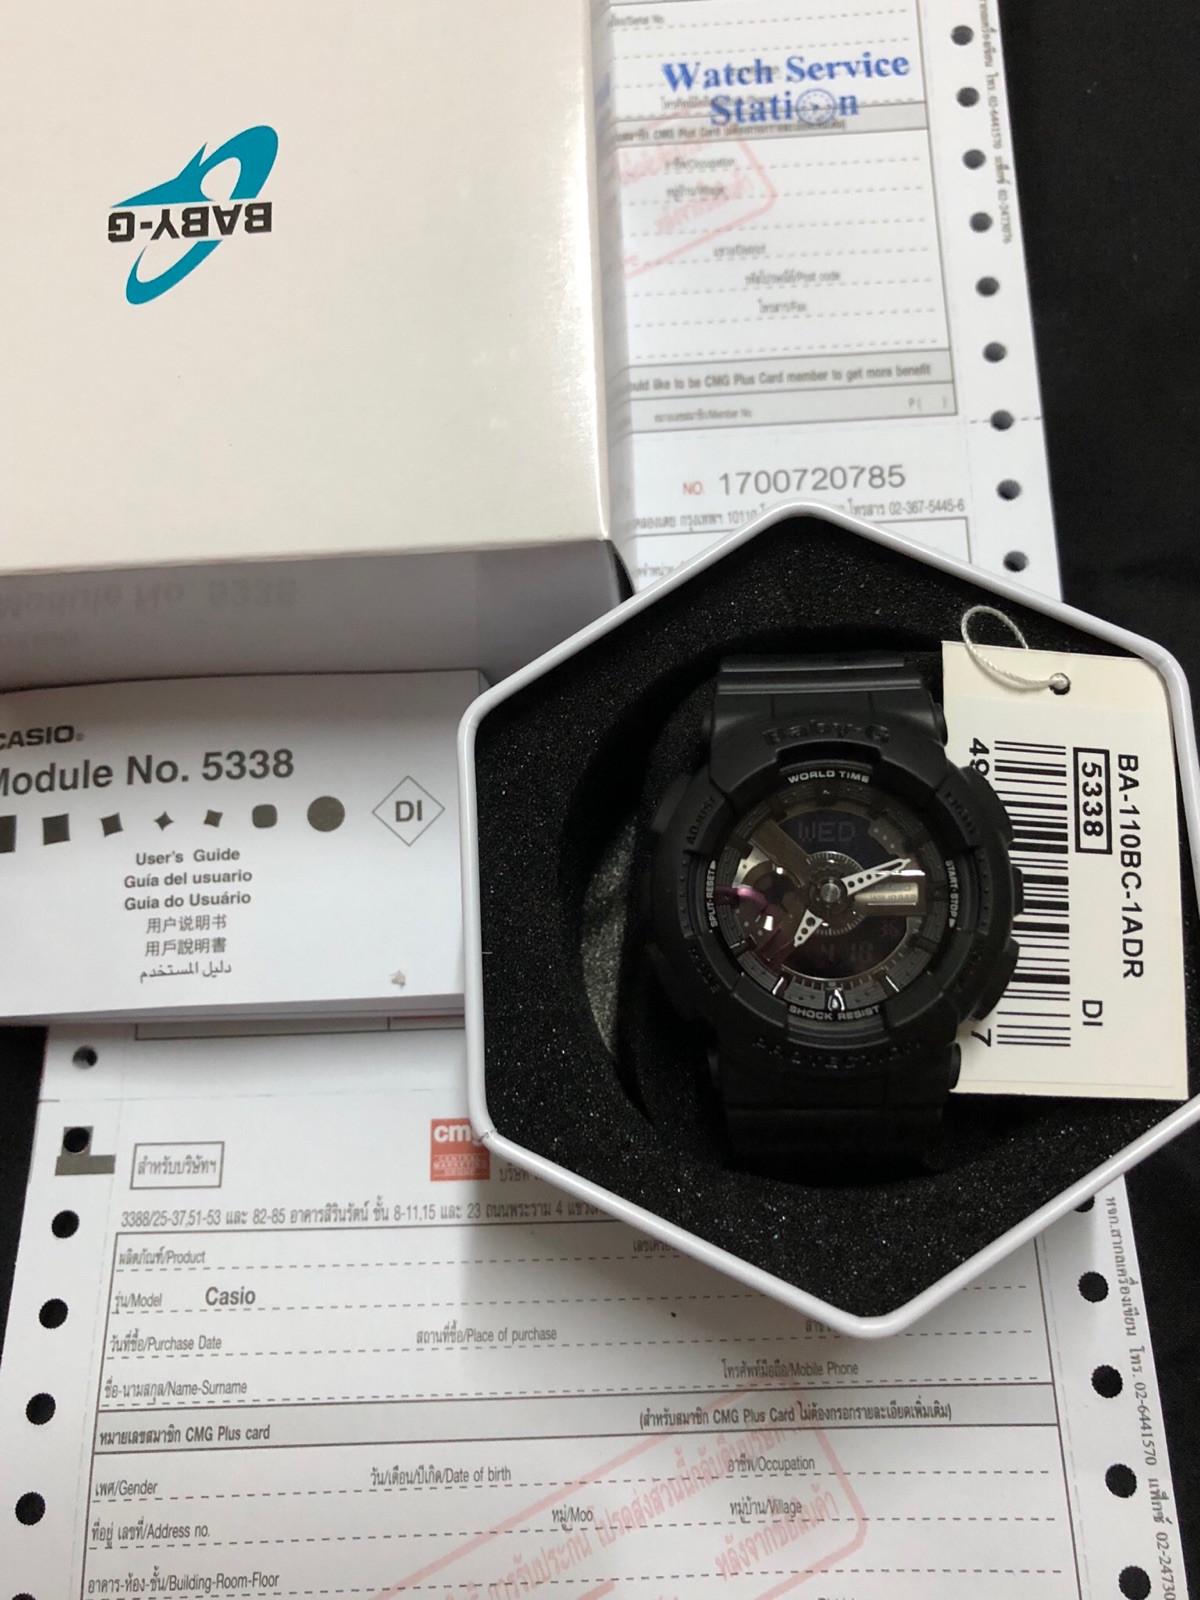 Relojes Casio Baby g 5338 de segunda mano (€88) Timepeaks